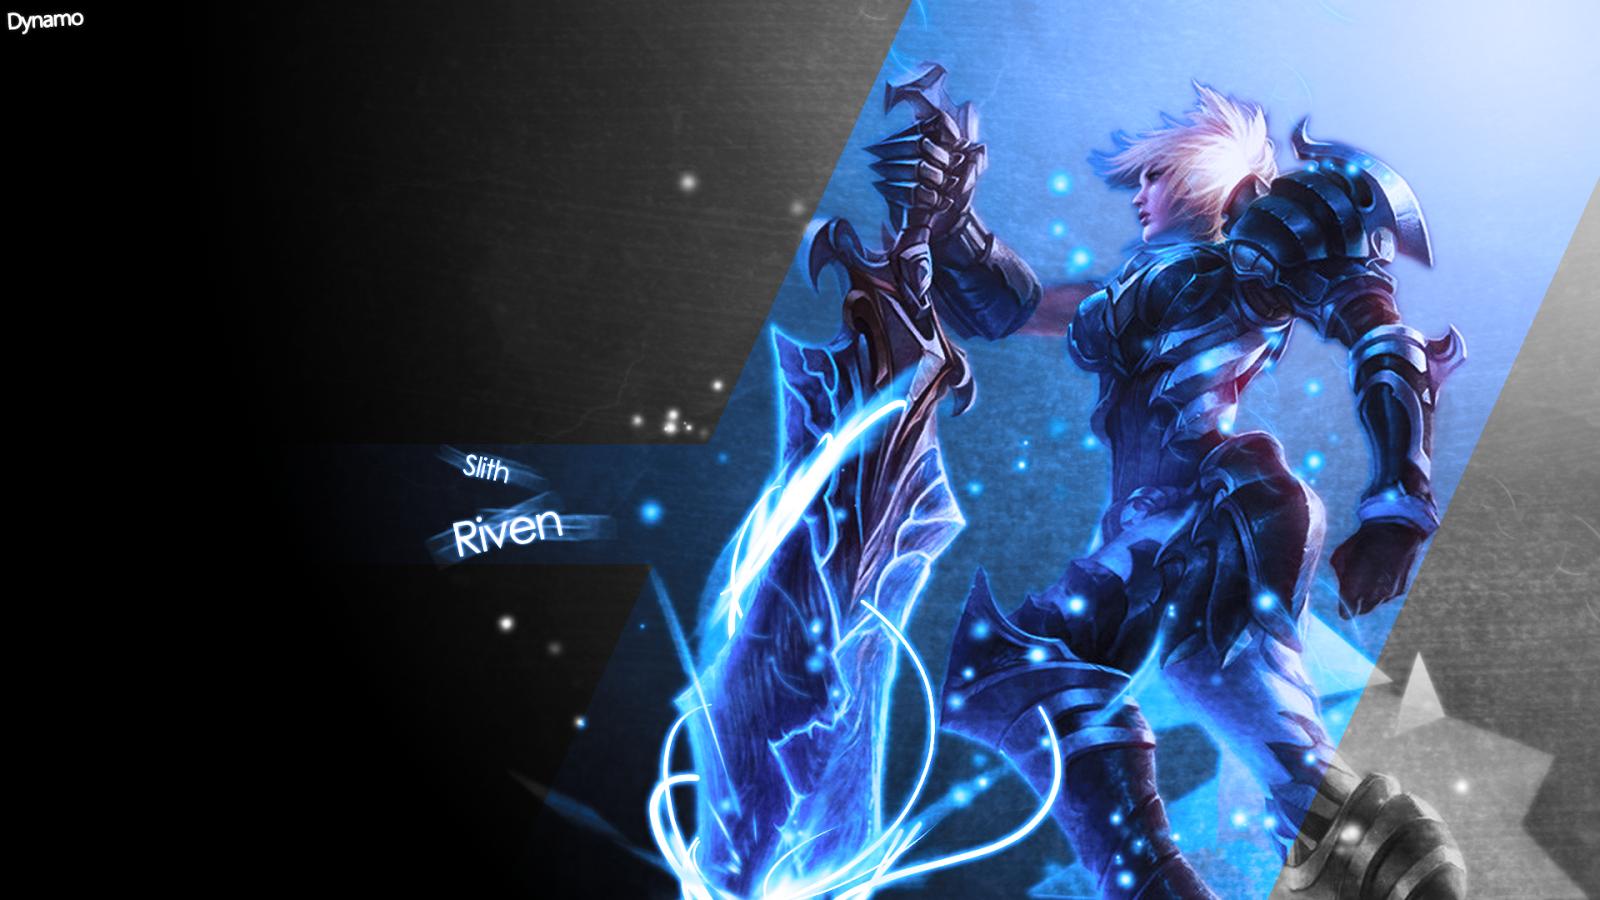 Riven League of Legends Wallpaper, Riven Desktop Wallpaper